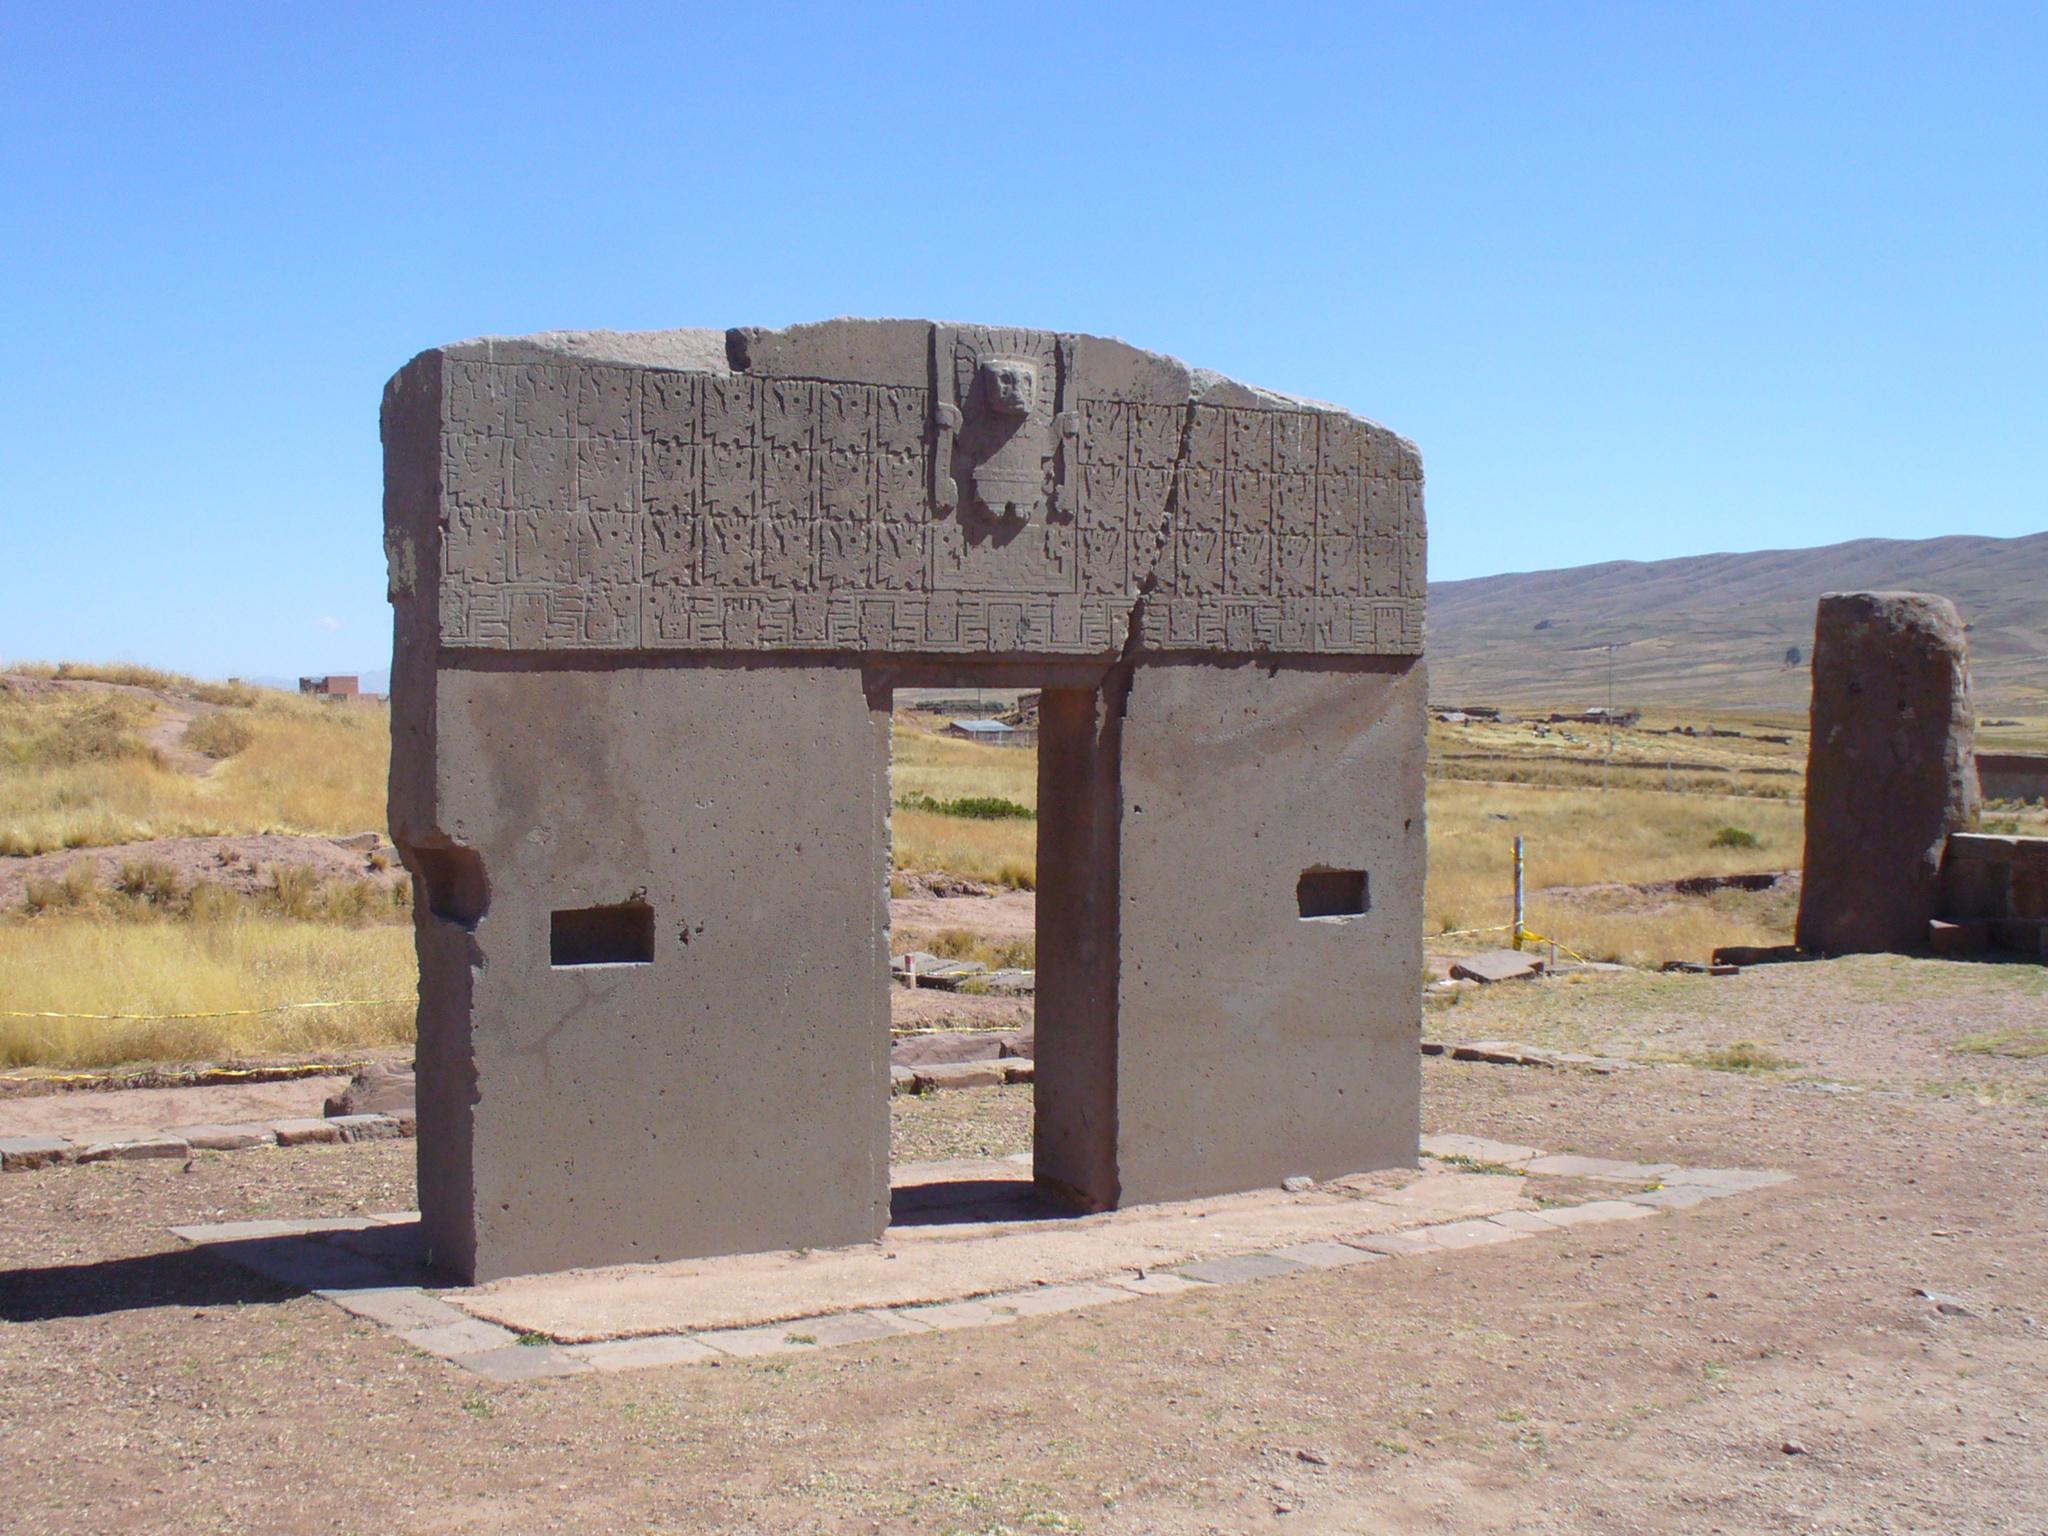 fichierpuerta del sol s237mbolo de tiwanaku boliviajpg